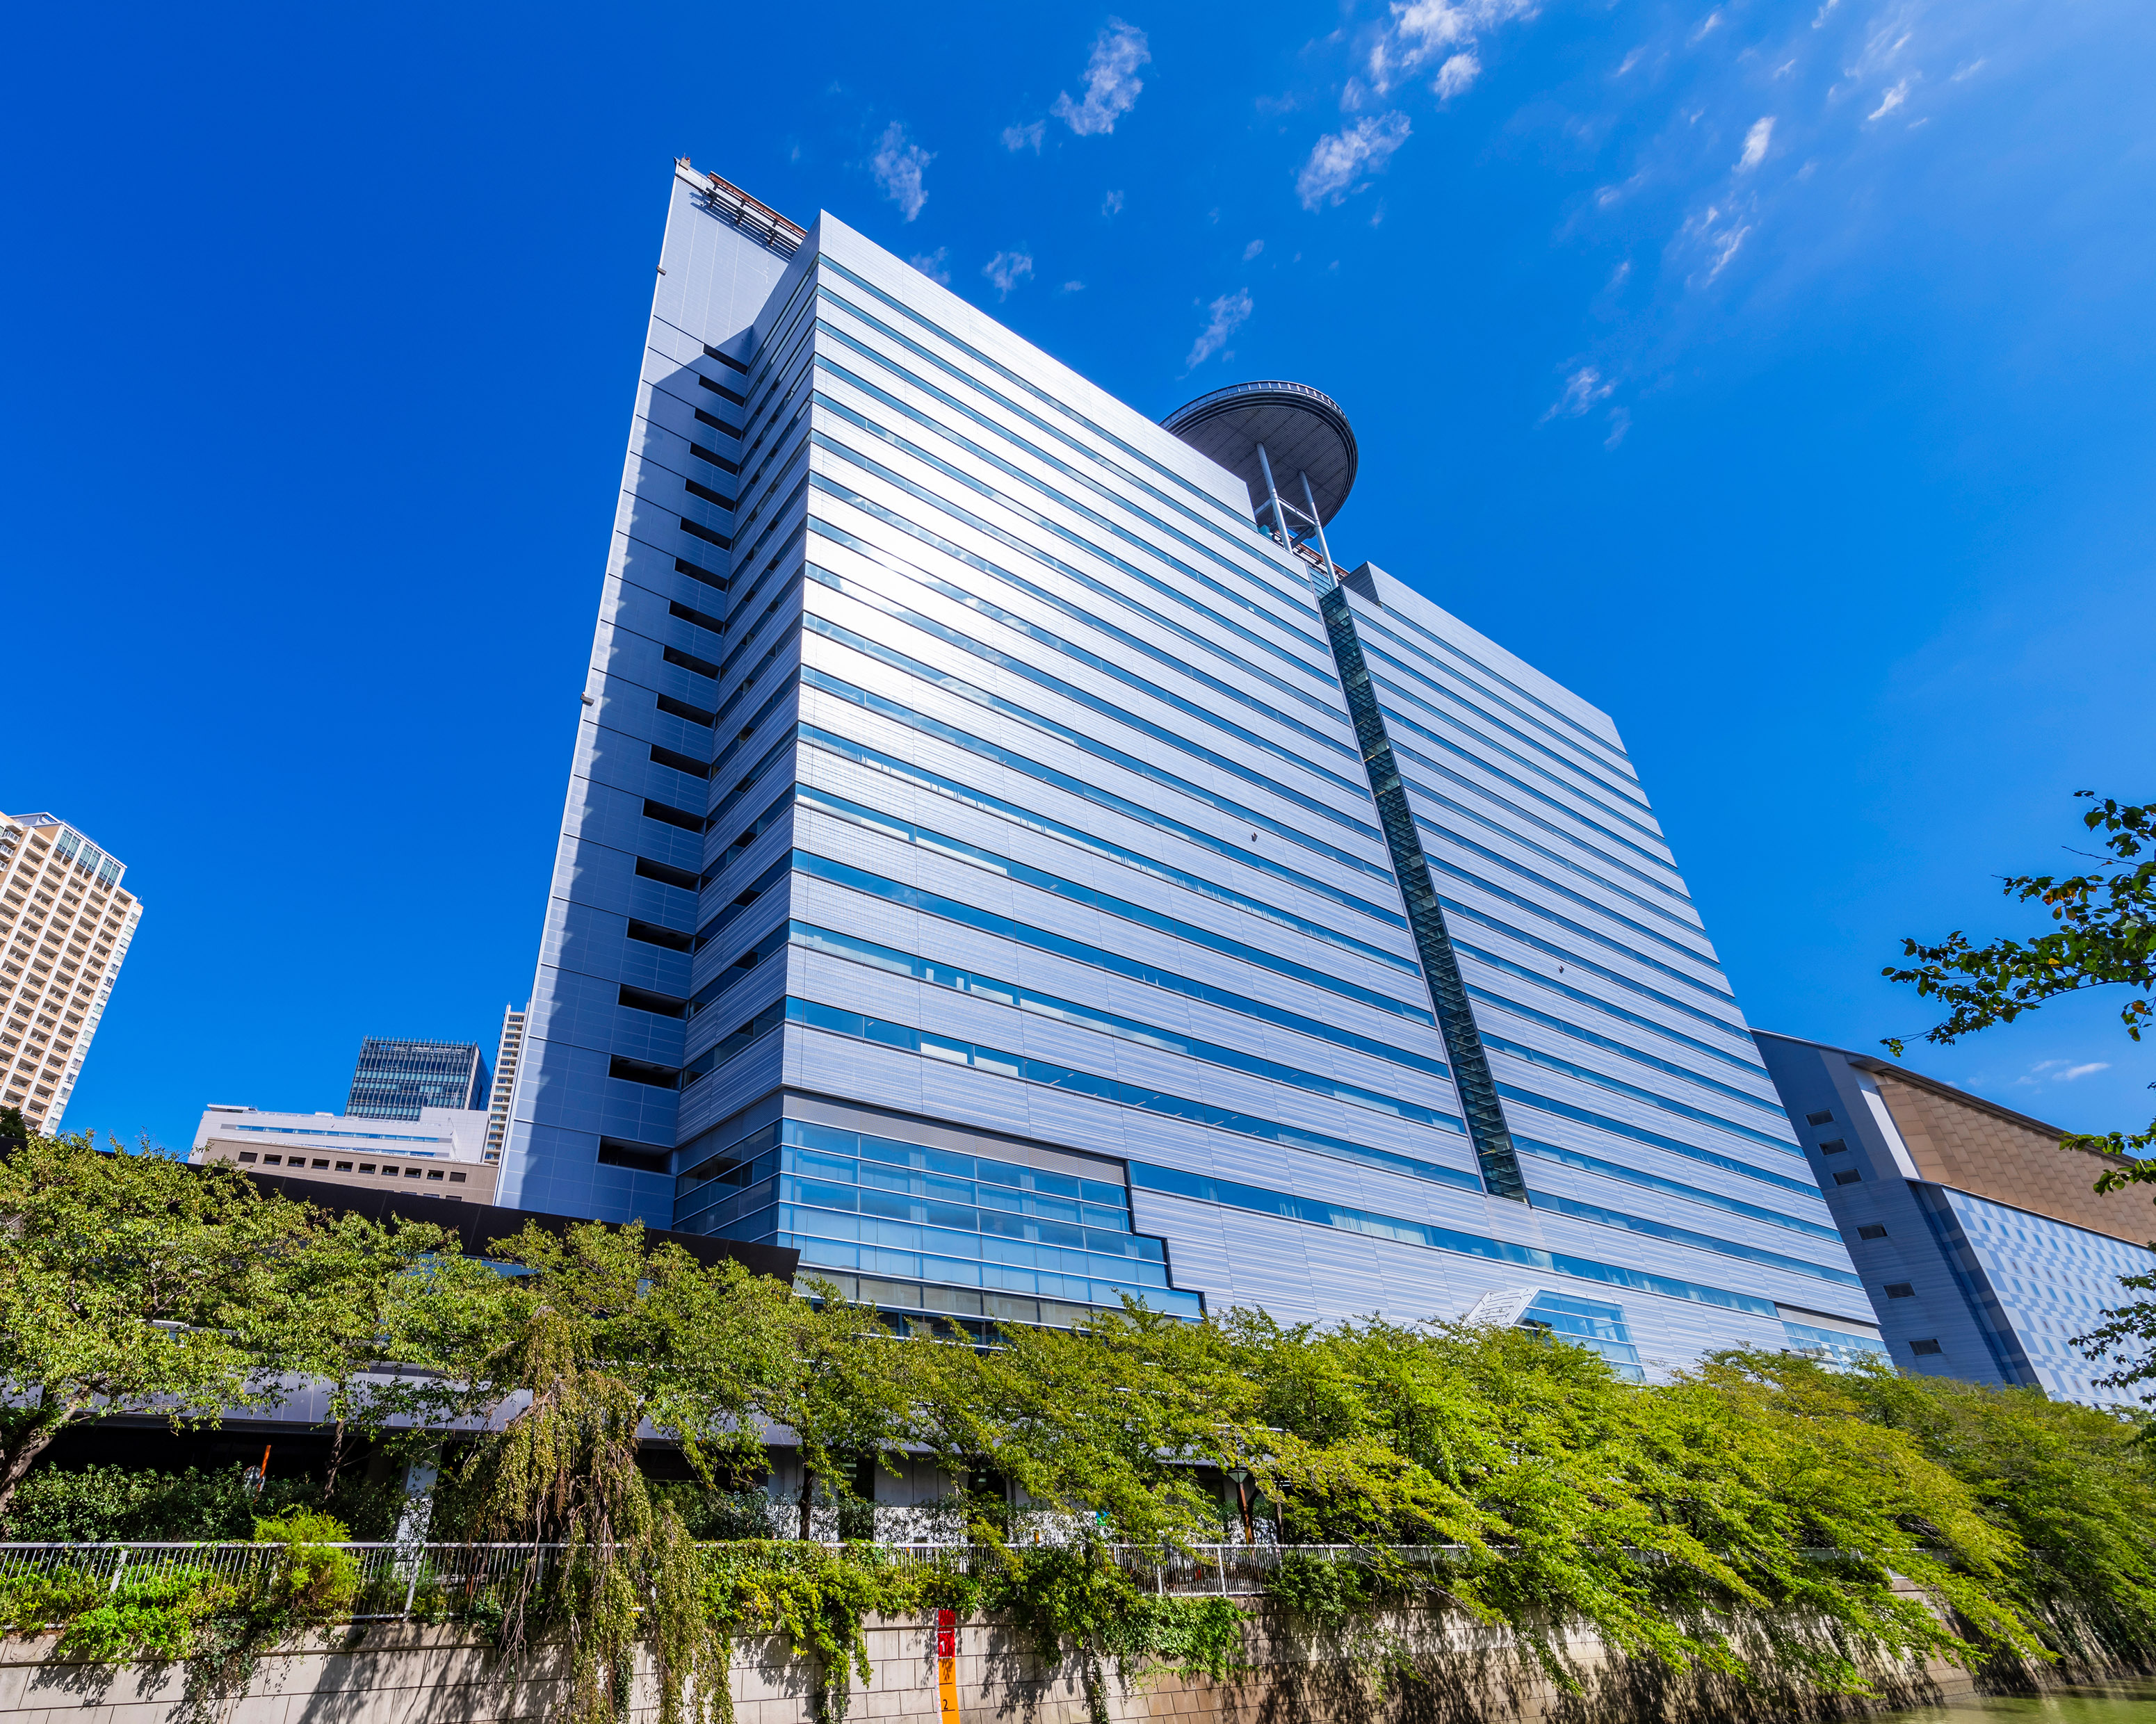 Meguro Arco Tower